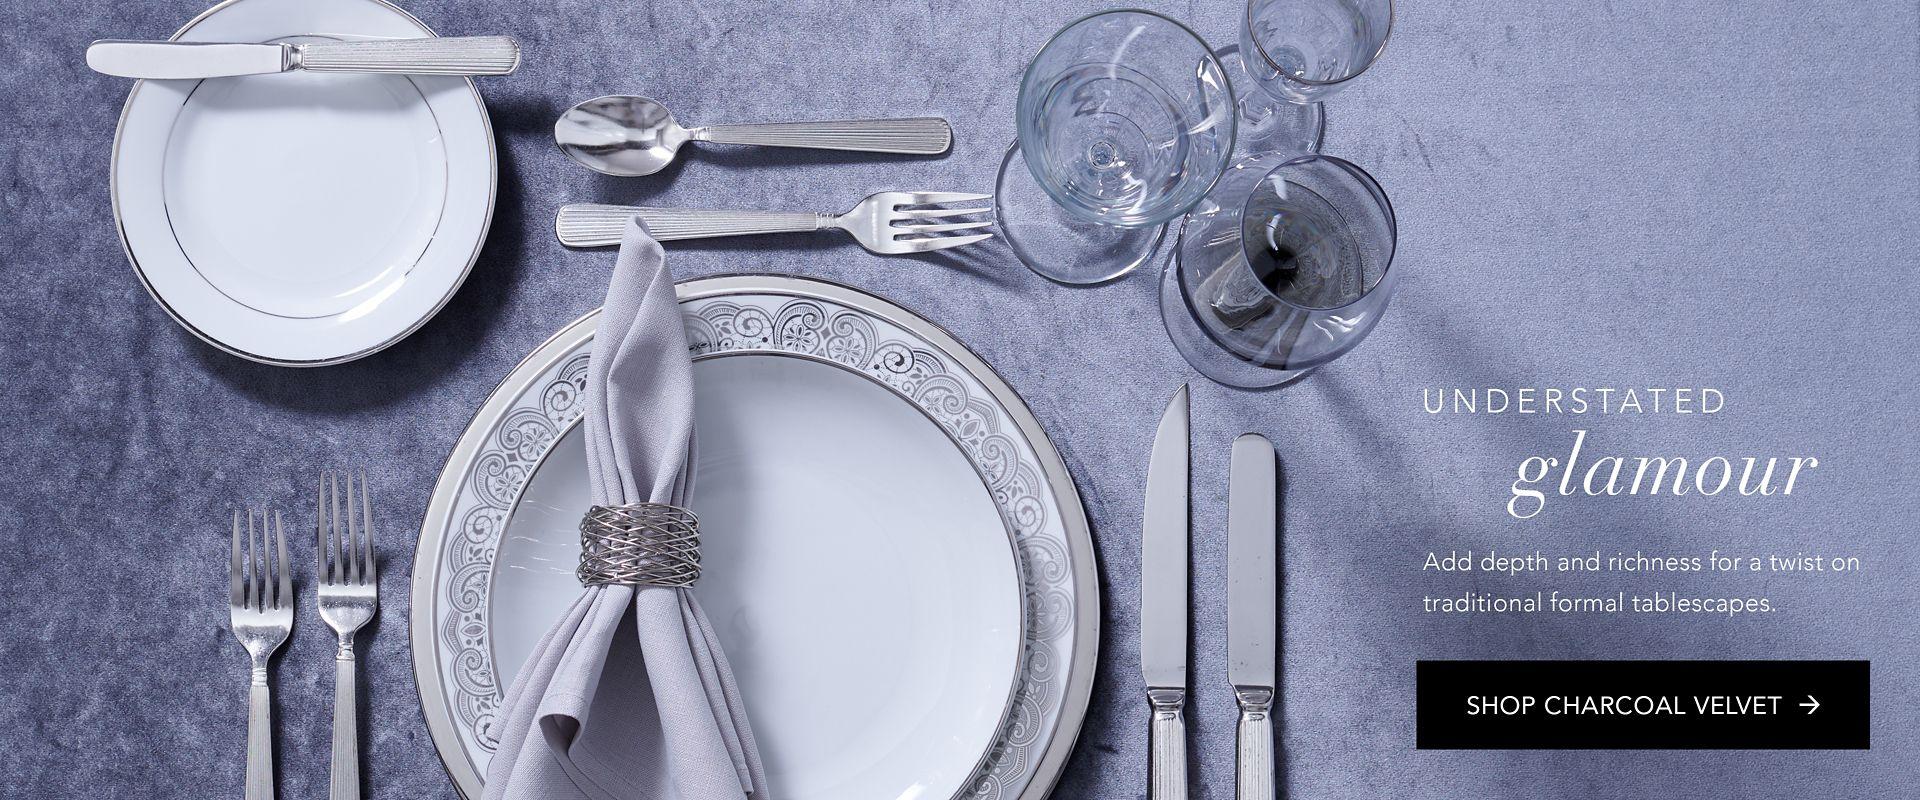 Shop Party Rental Ltd. Charcoal Velvet Linen